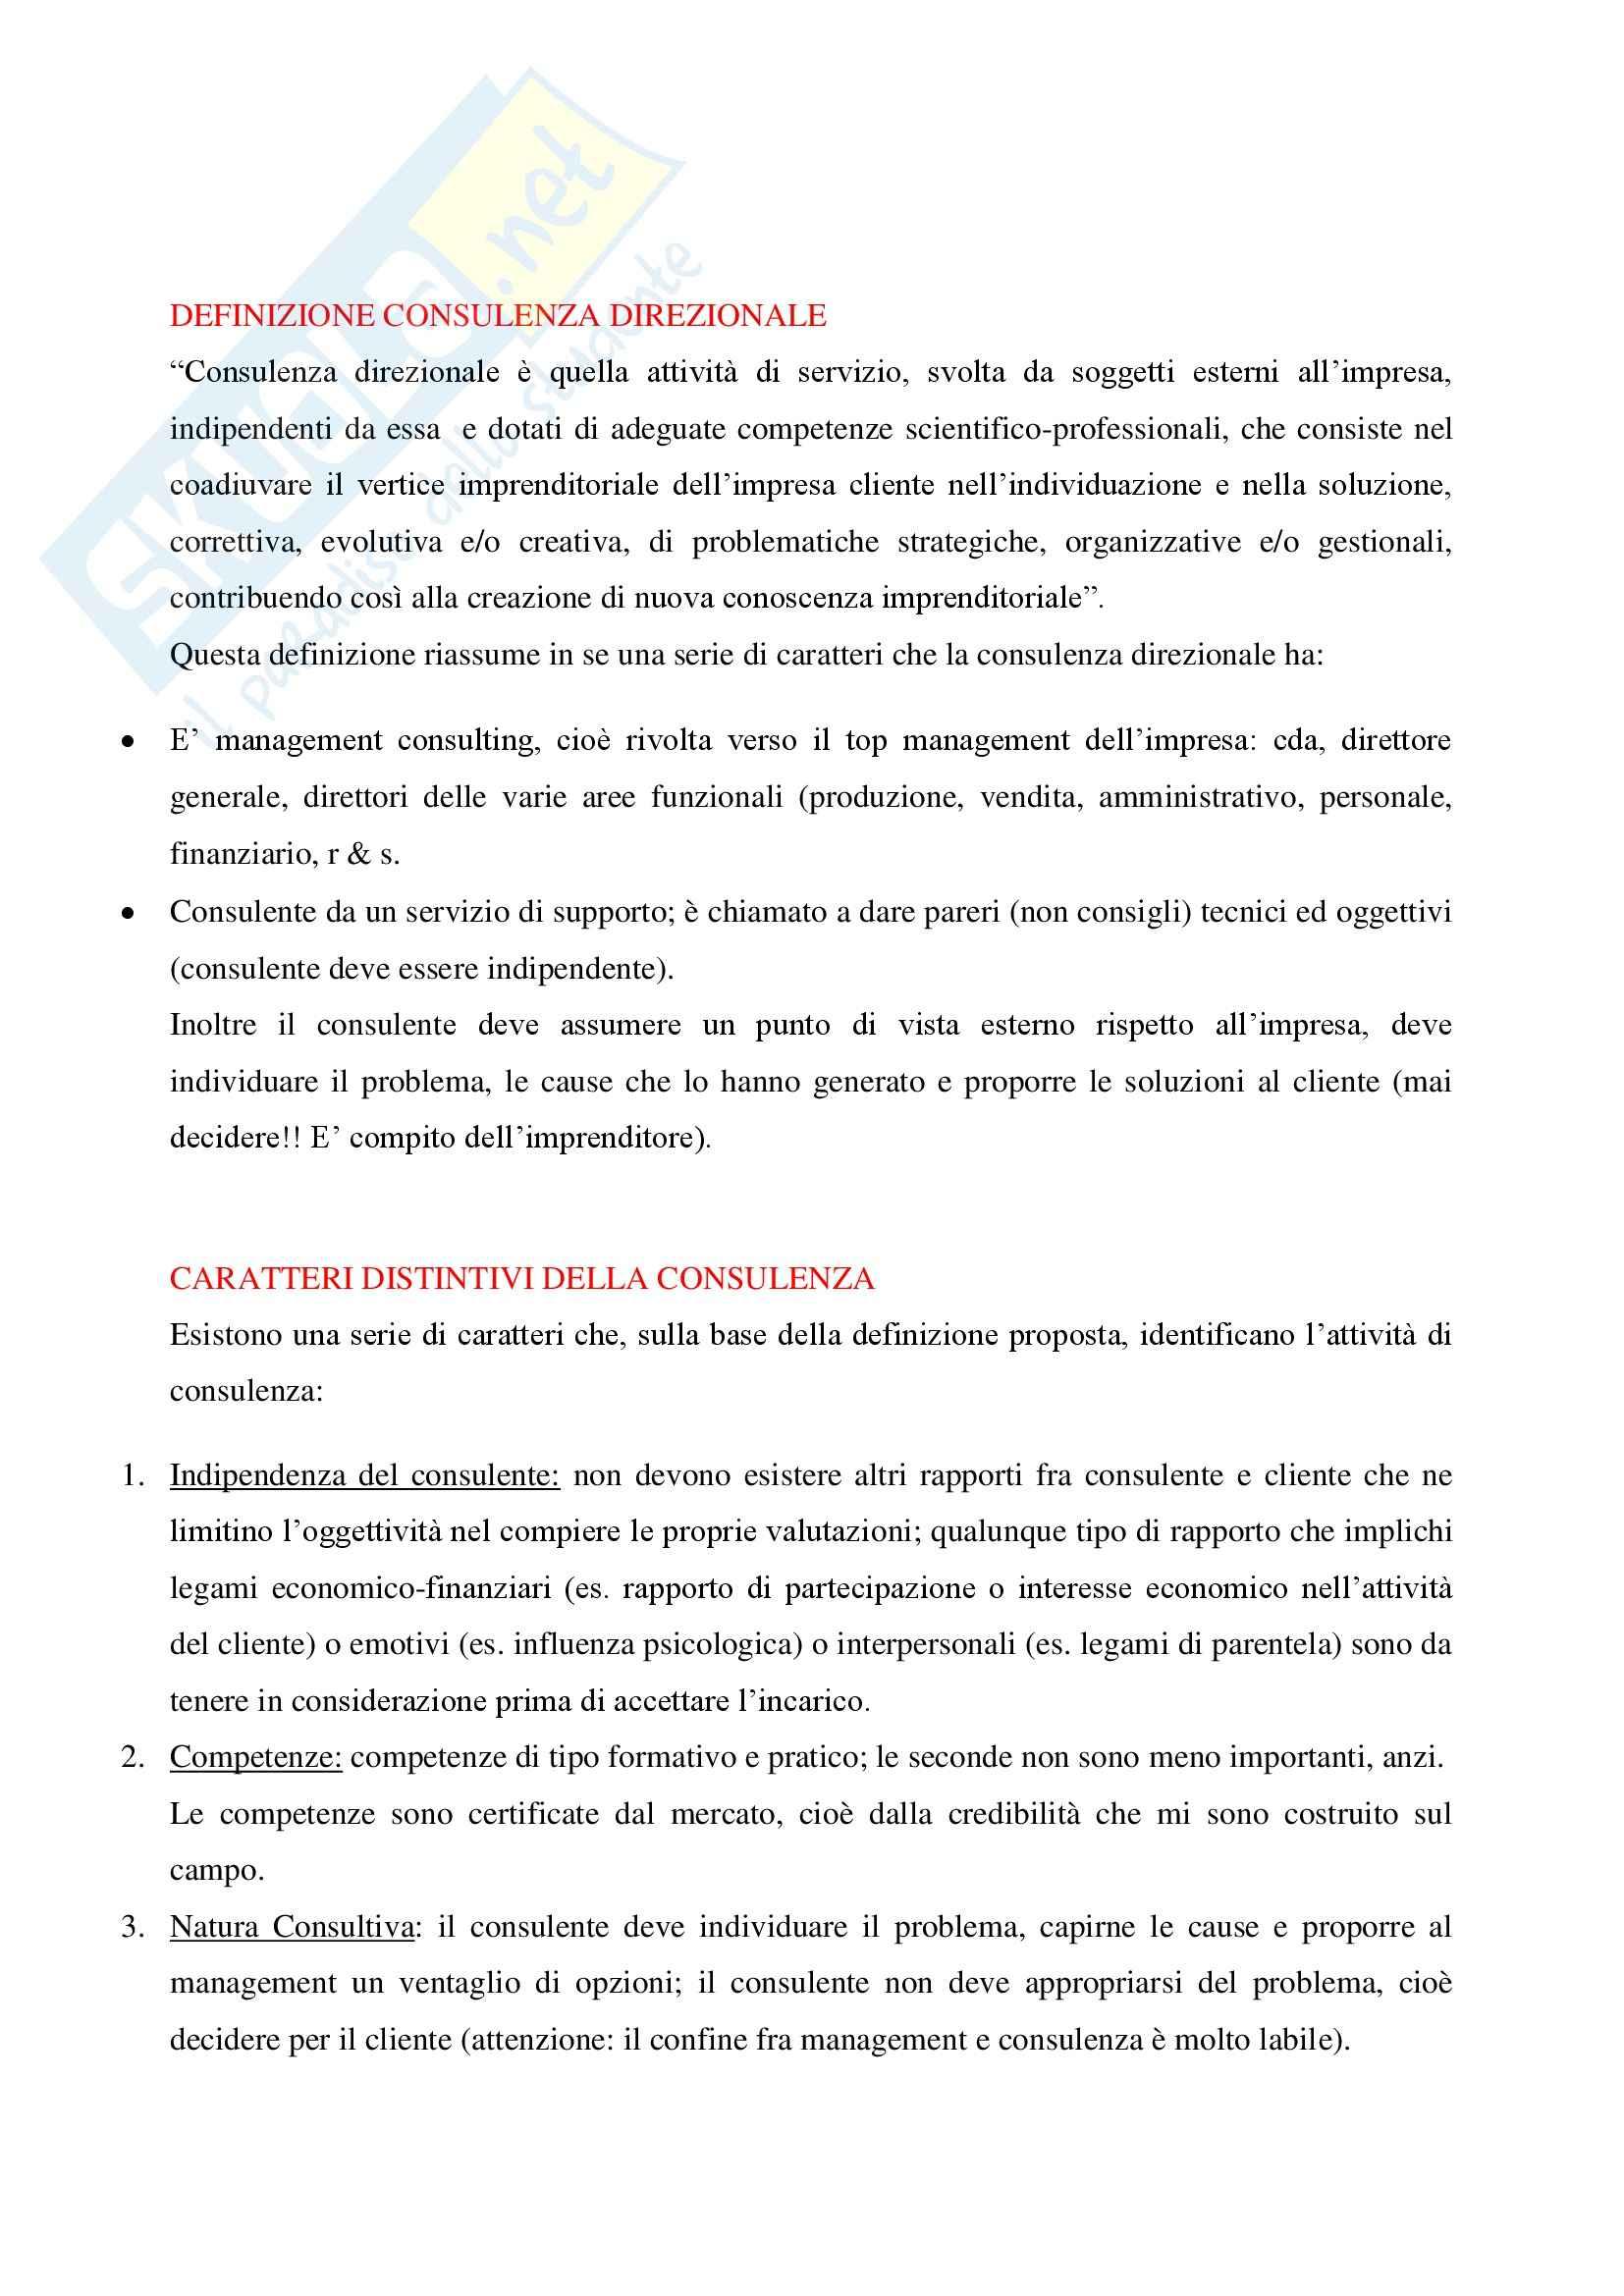 Riassunto esame Consulenza Direzionale, prof. Ciampi, libro consigliato Consulenza Direzionale di Ciampi